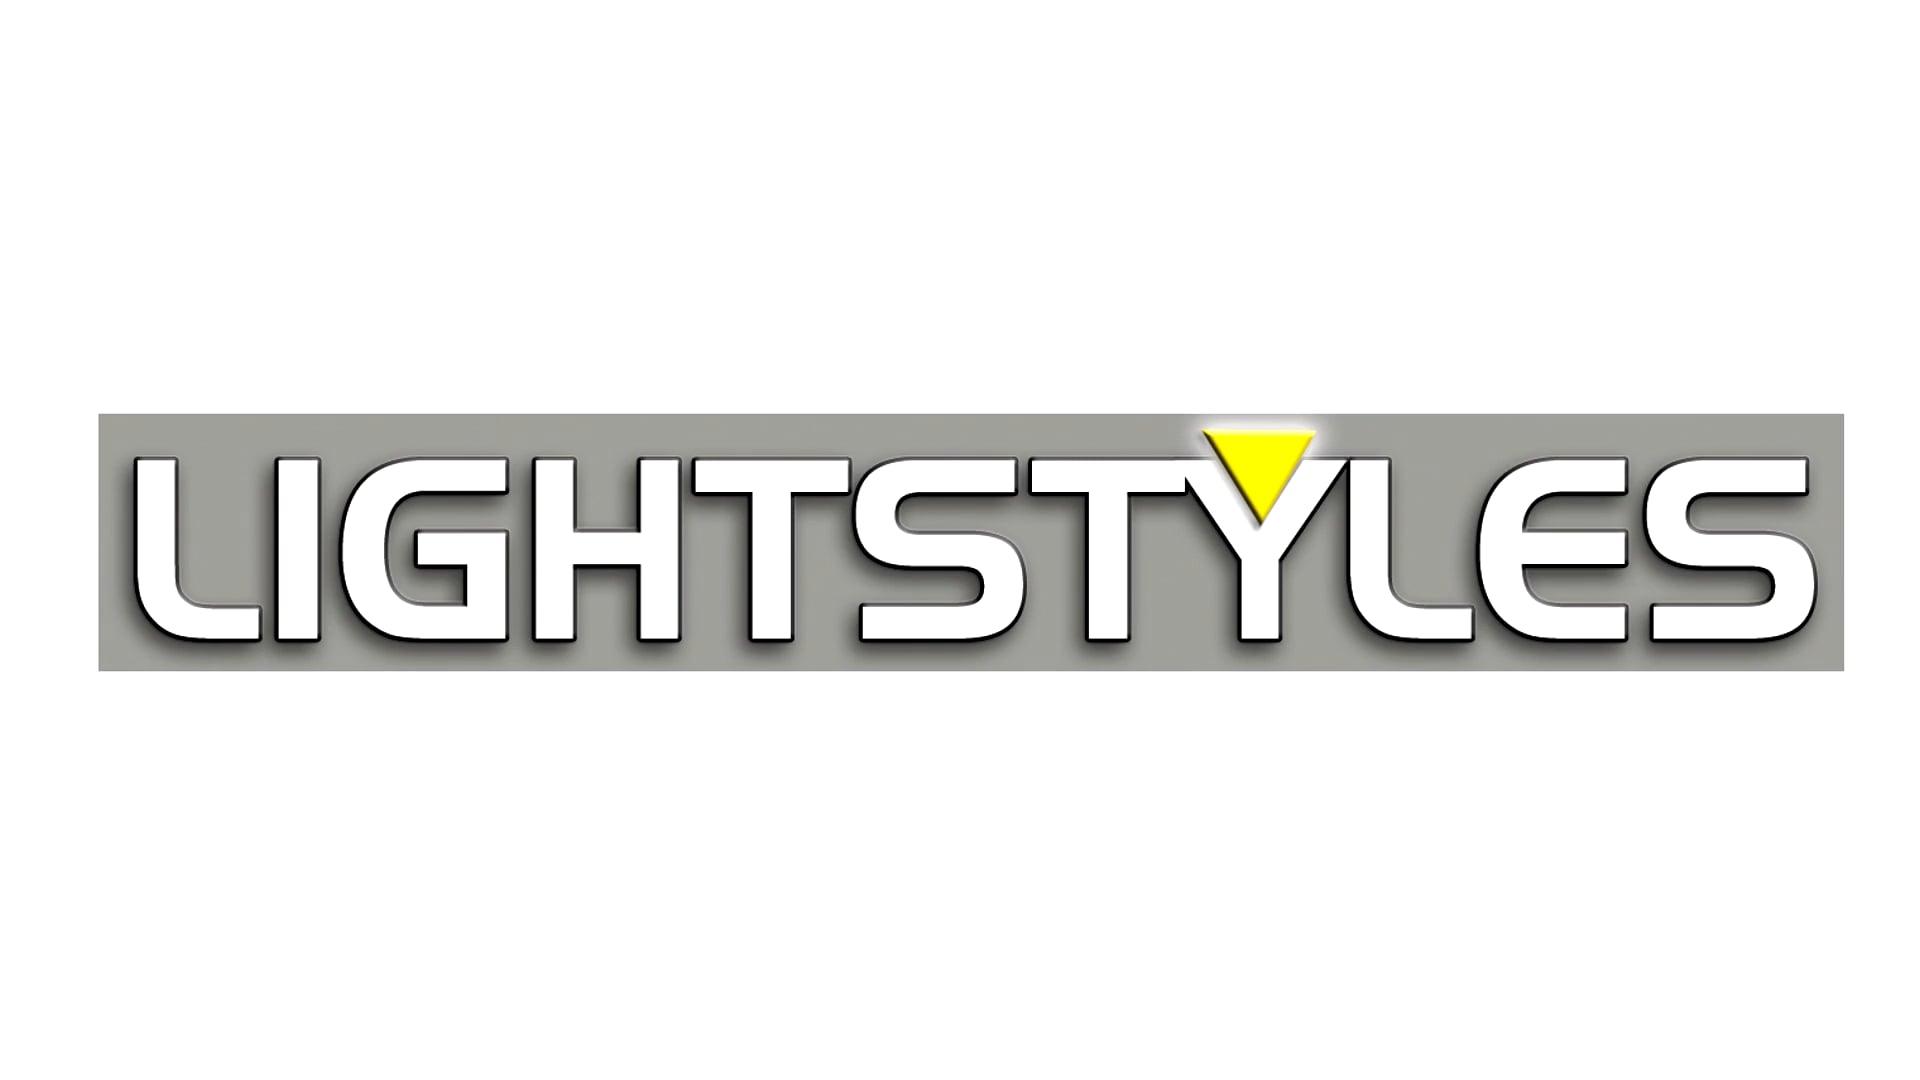 Lightstyles